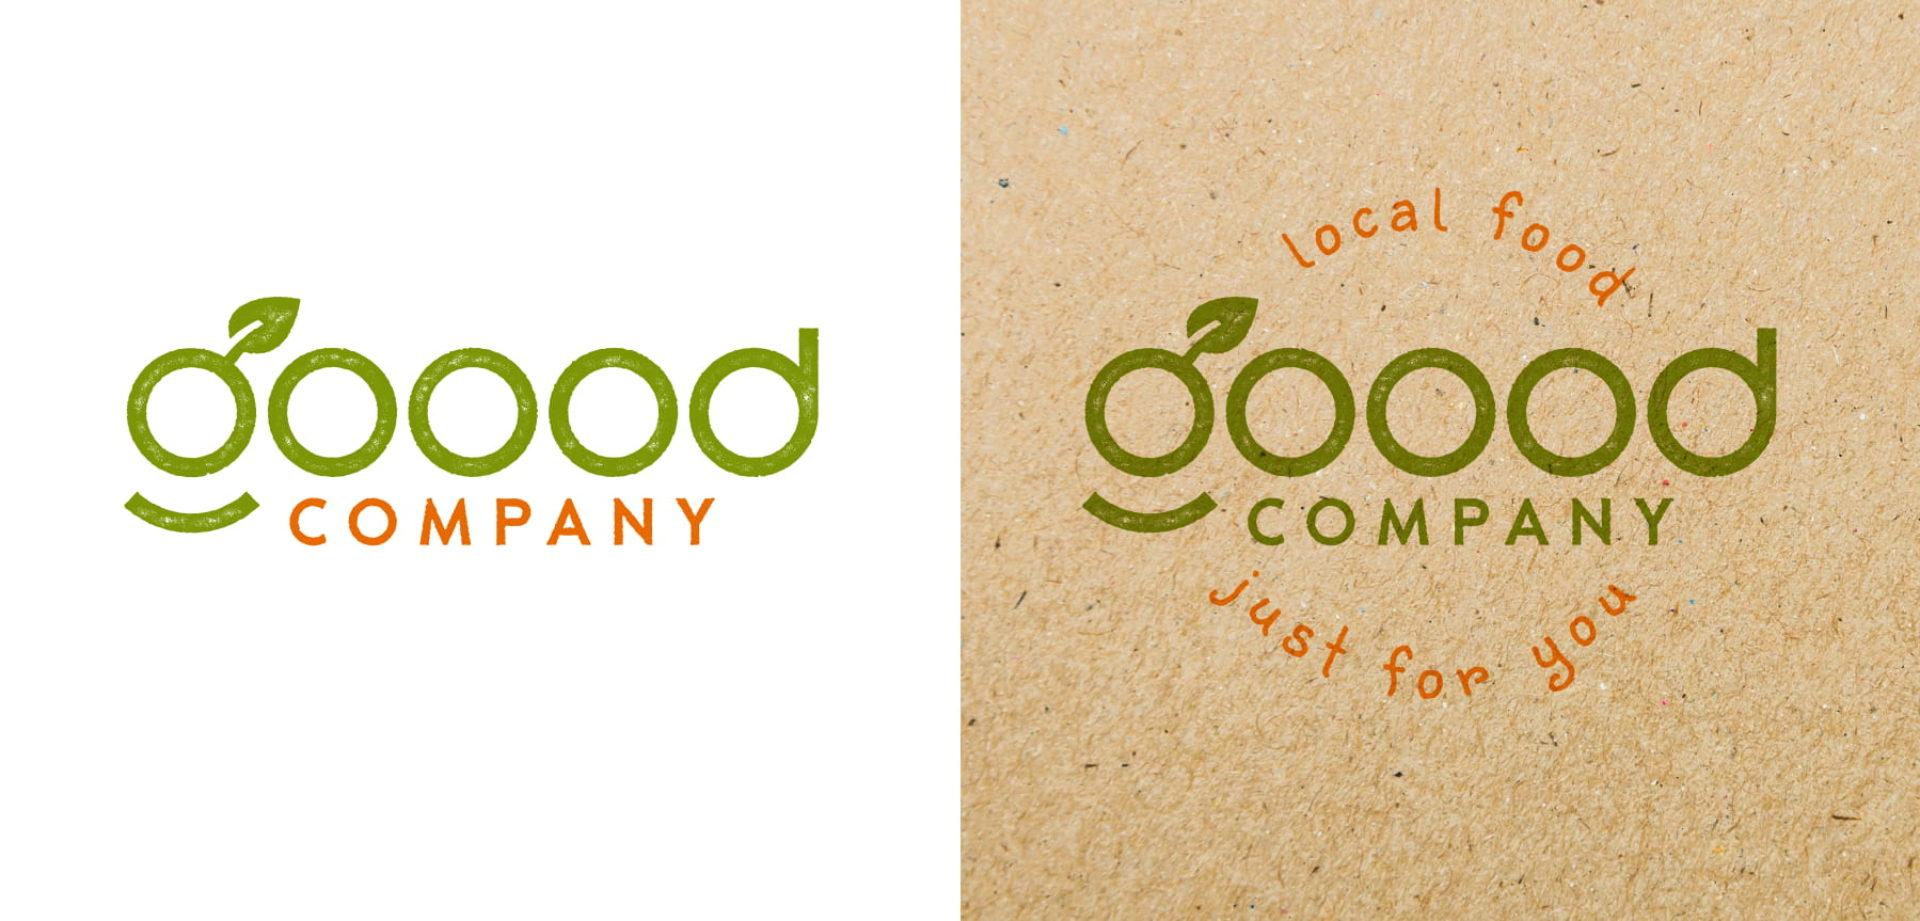 Goood Company logo - Rene Verkaart)